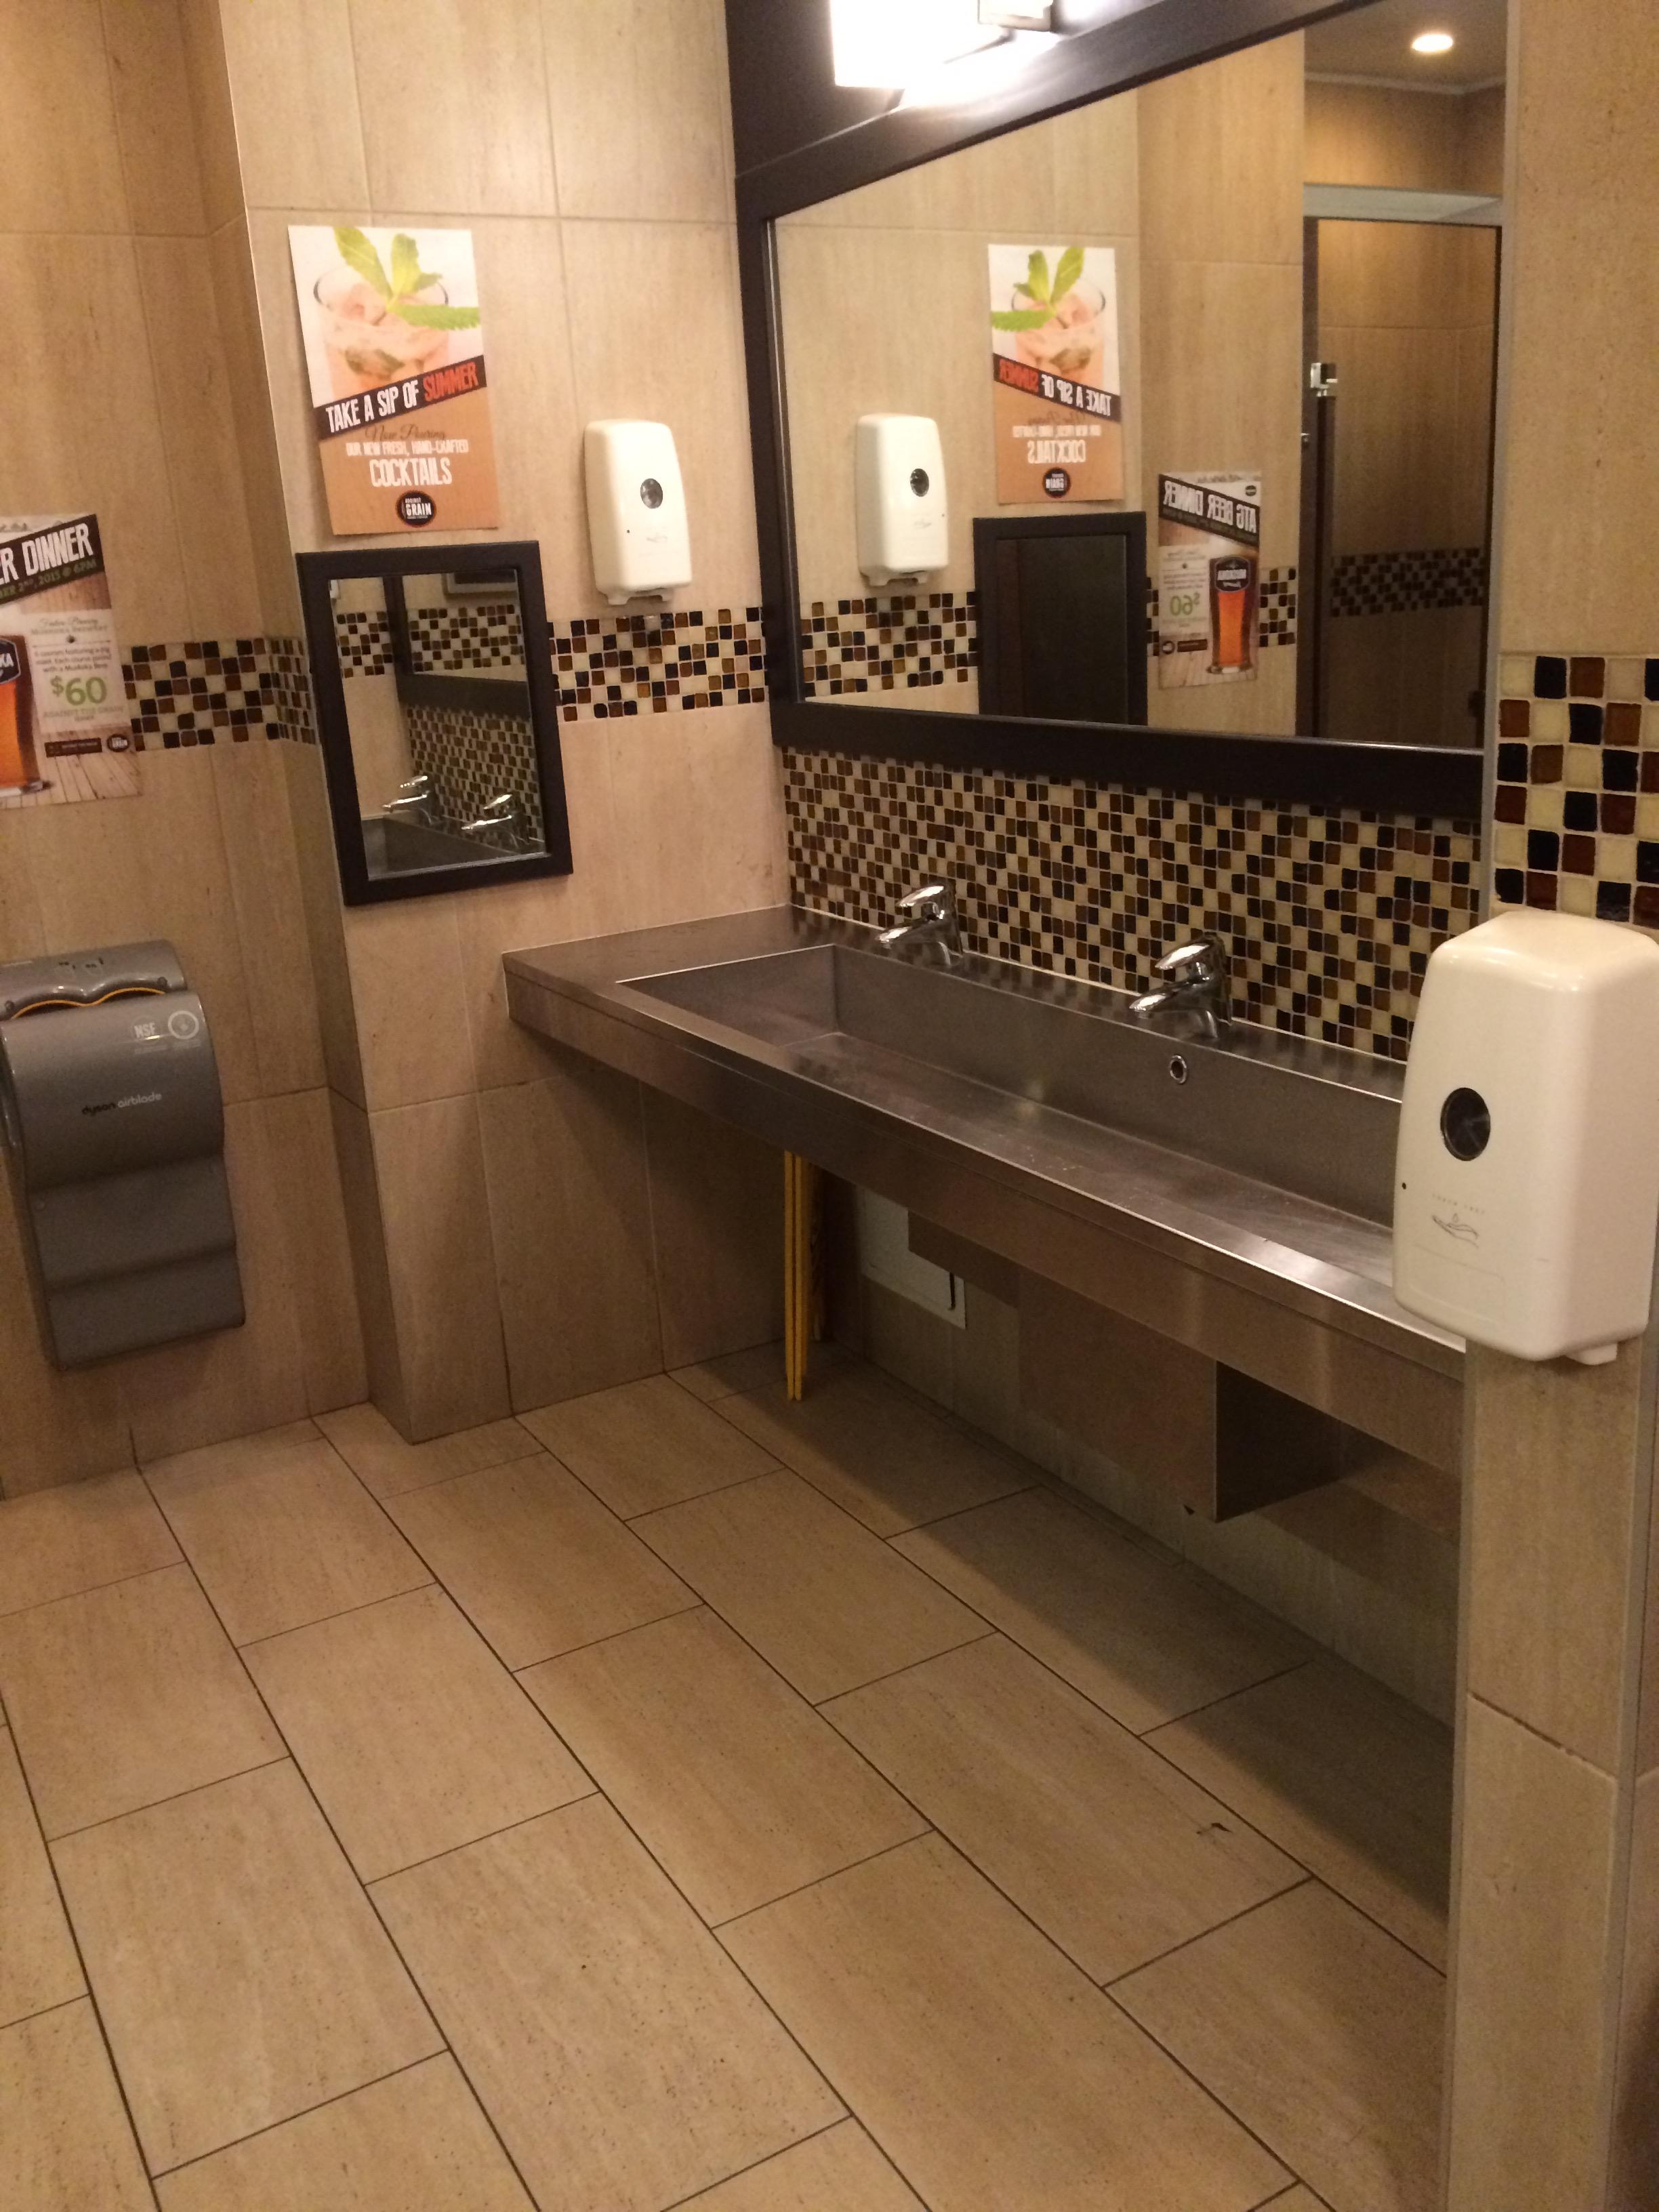 Image of accessible bathroom sink area.